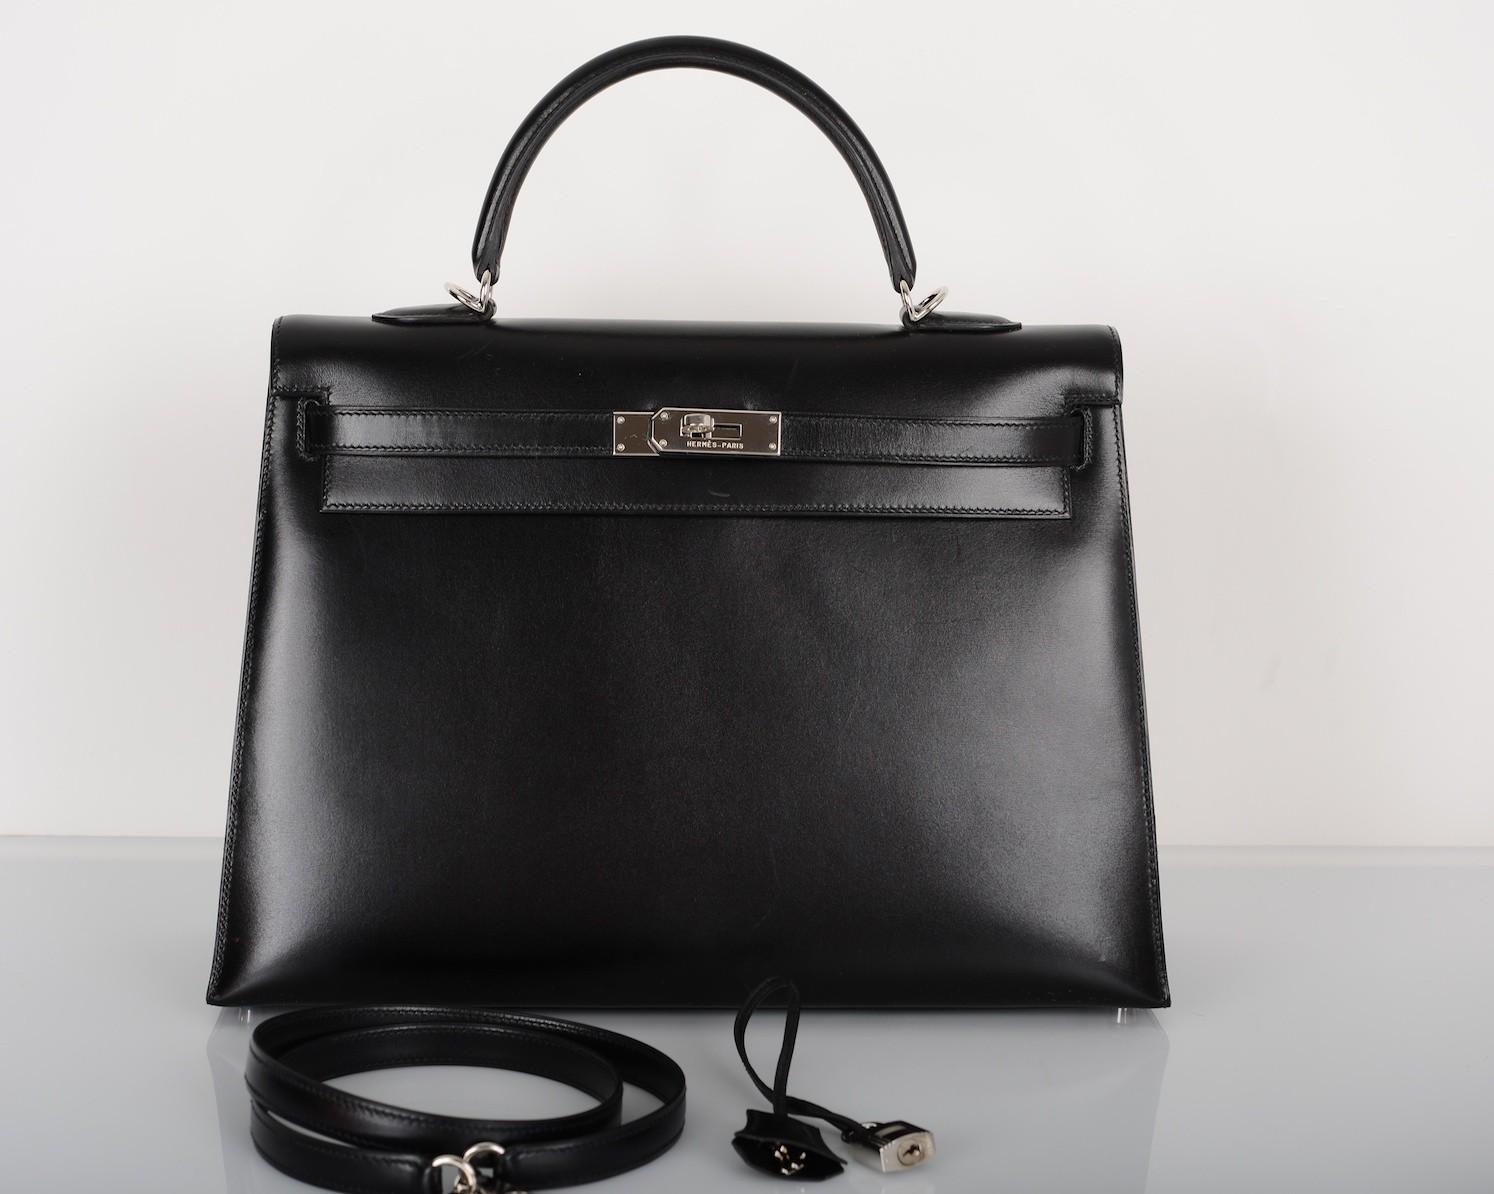 Hermès Black Box Leather 35cm Kelly Bag Palladium Hardware | Portero Luxury